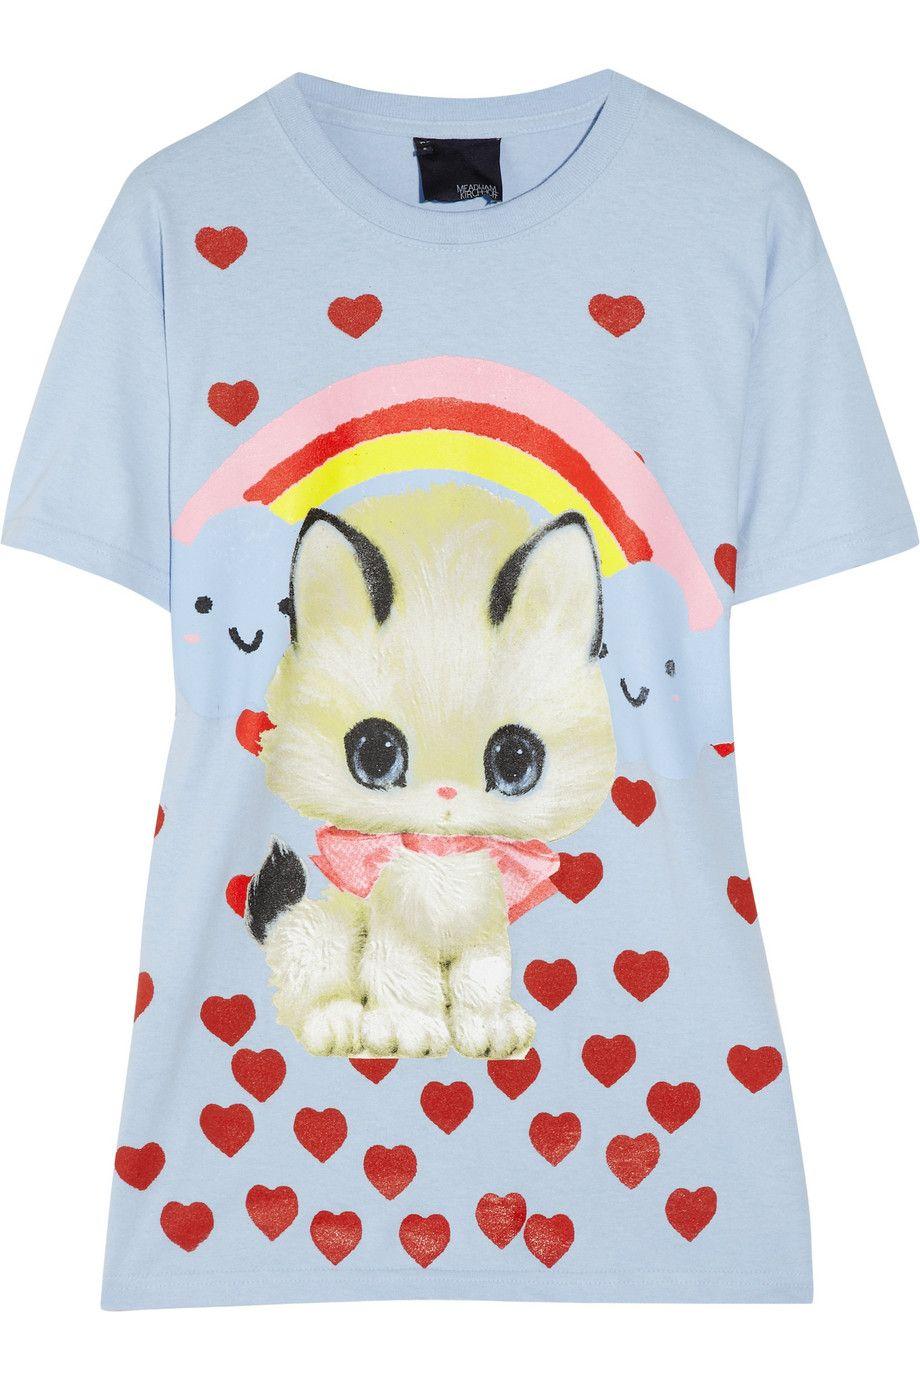 meadham kirchhoff t-shirt